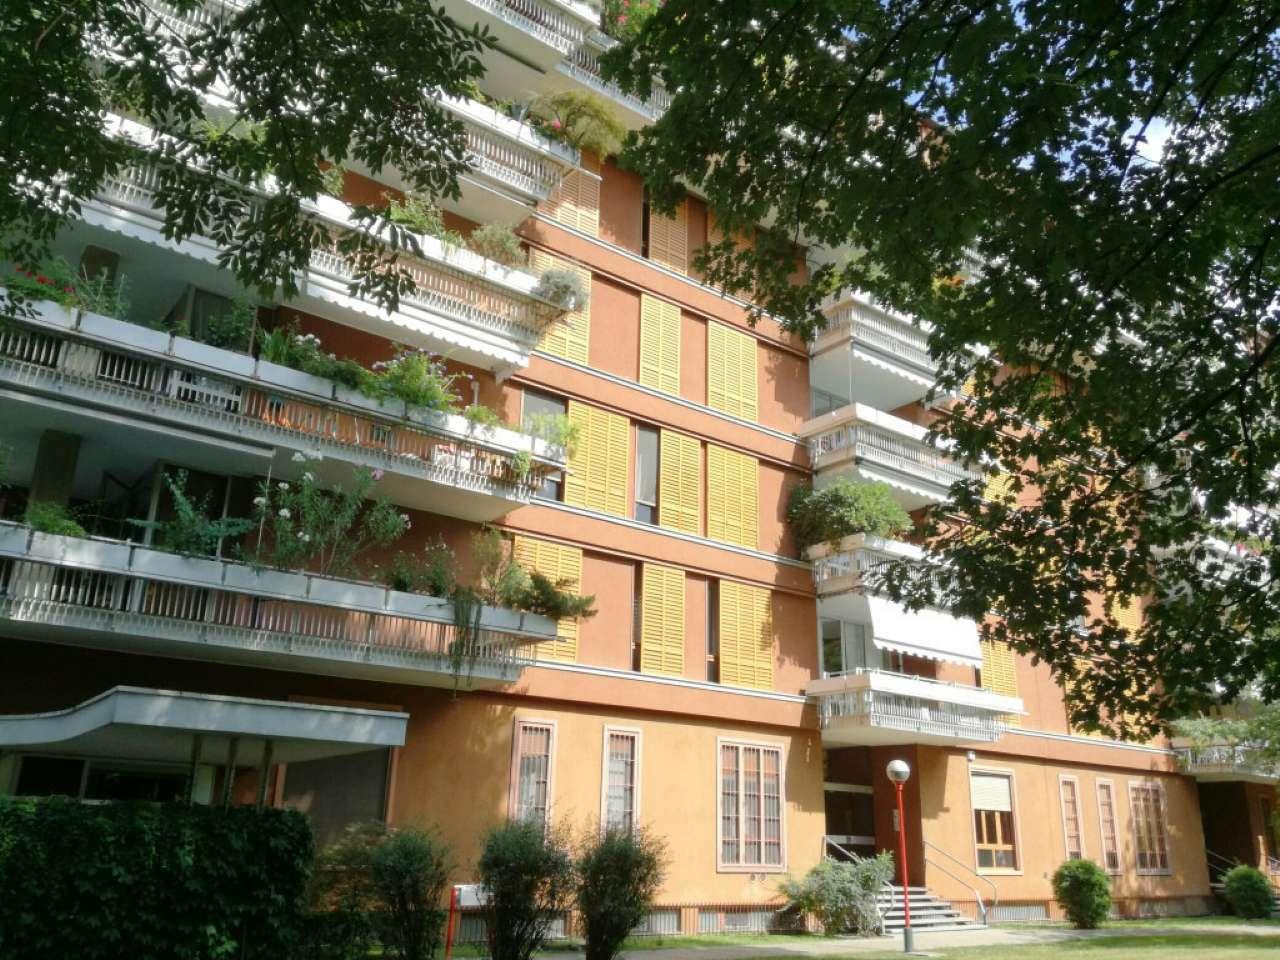 Appartamento in Vendita a Segrate via fratelli cervi